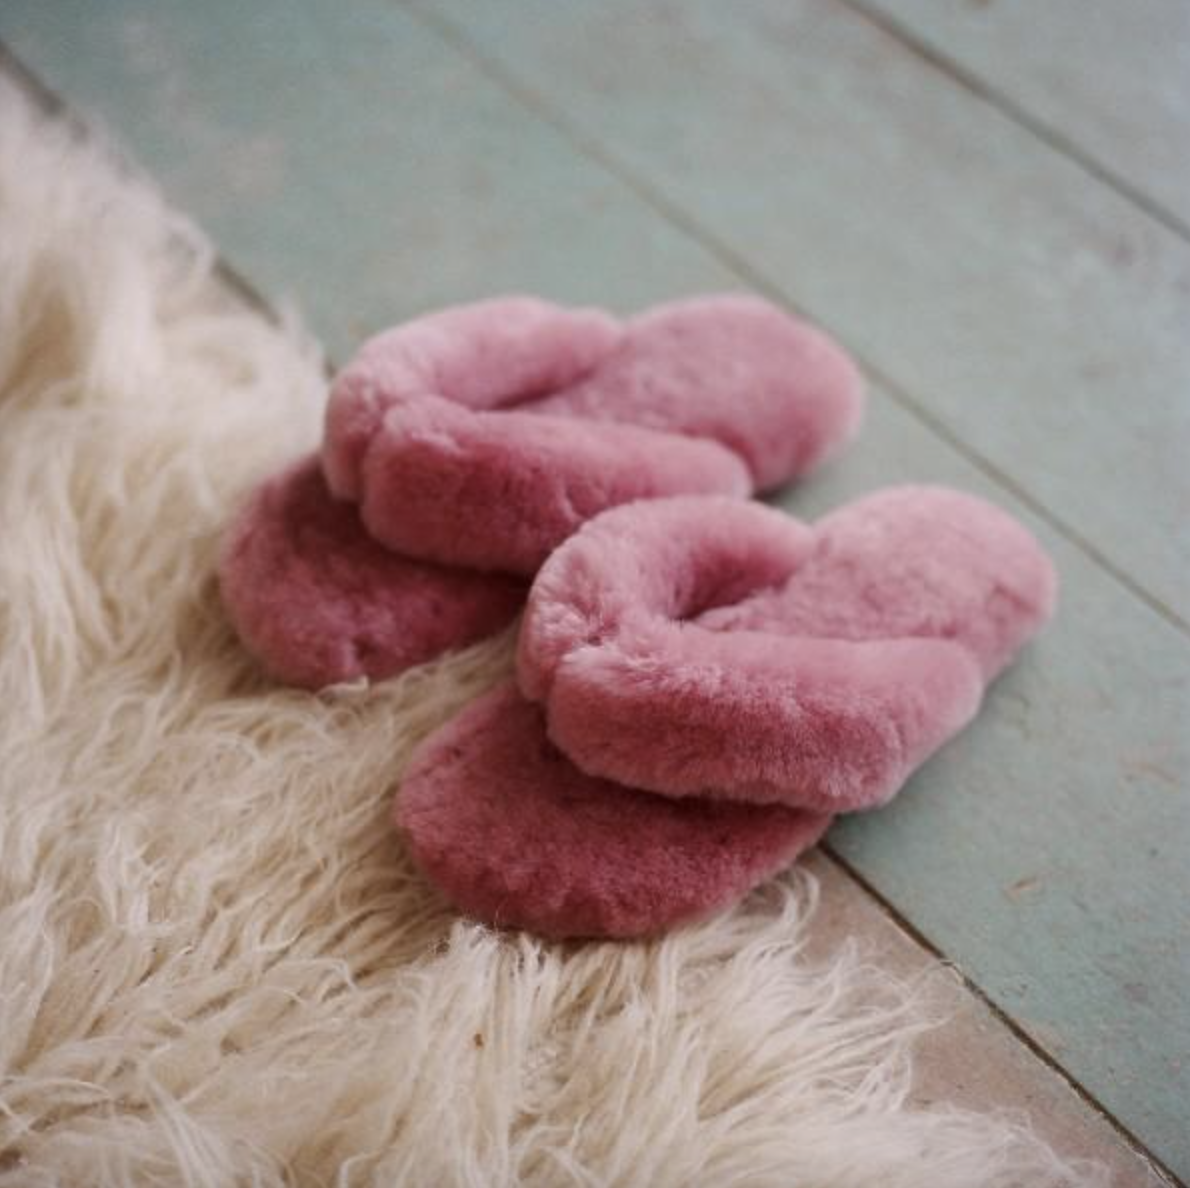 flip-flop style pink sheepskin slippers on a floor